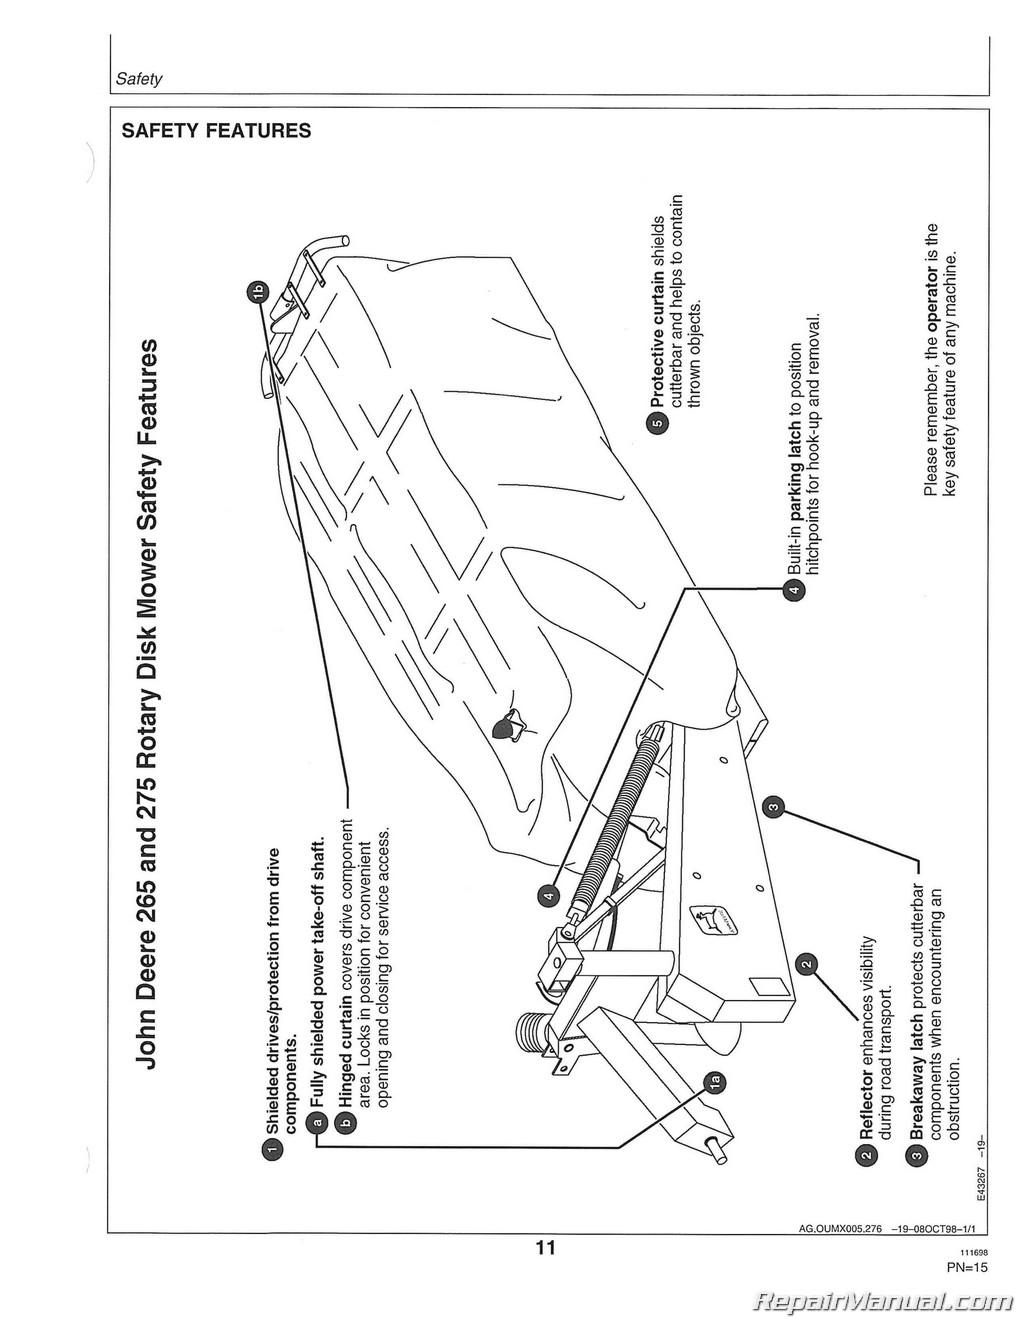 john deere model l110 lawn tractor parts page 2